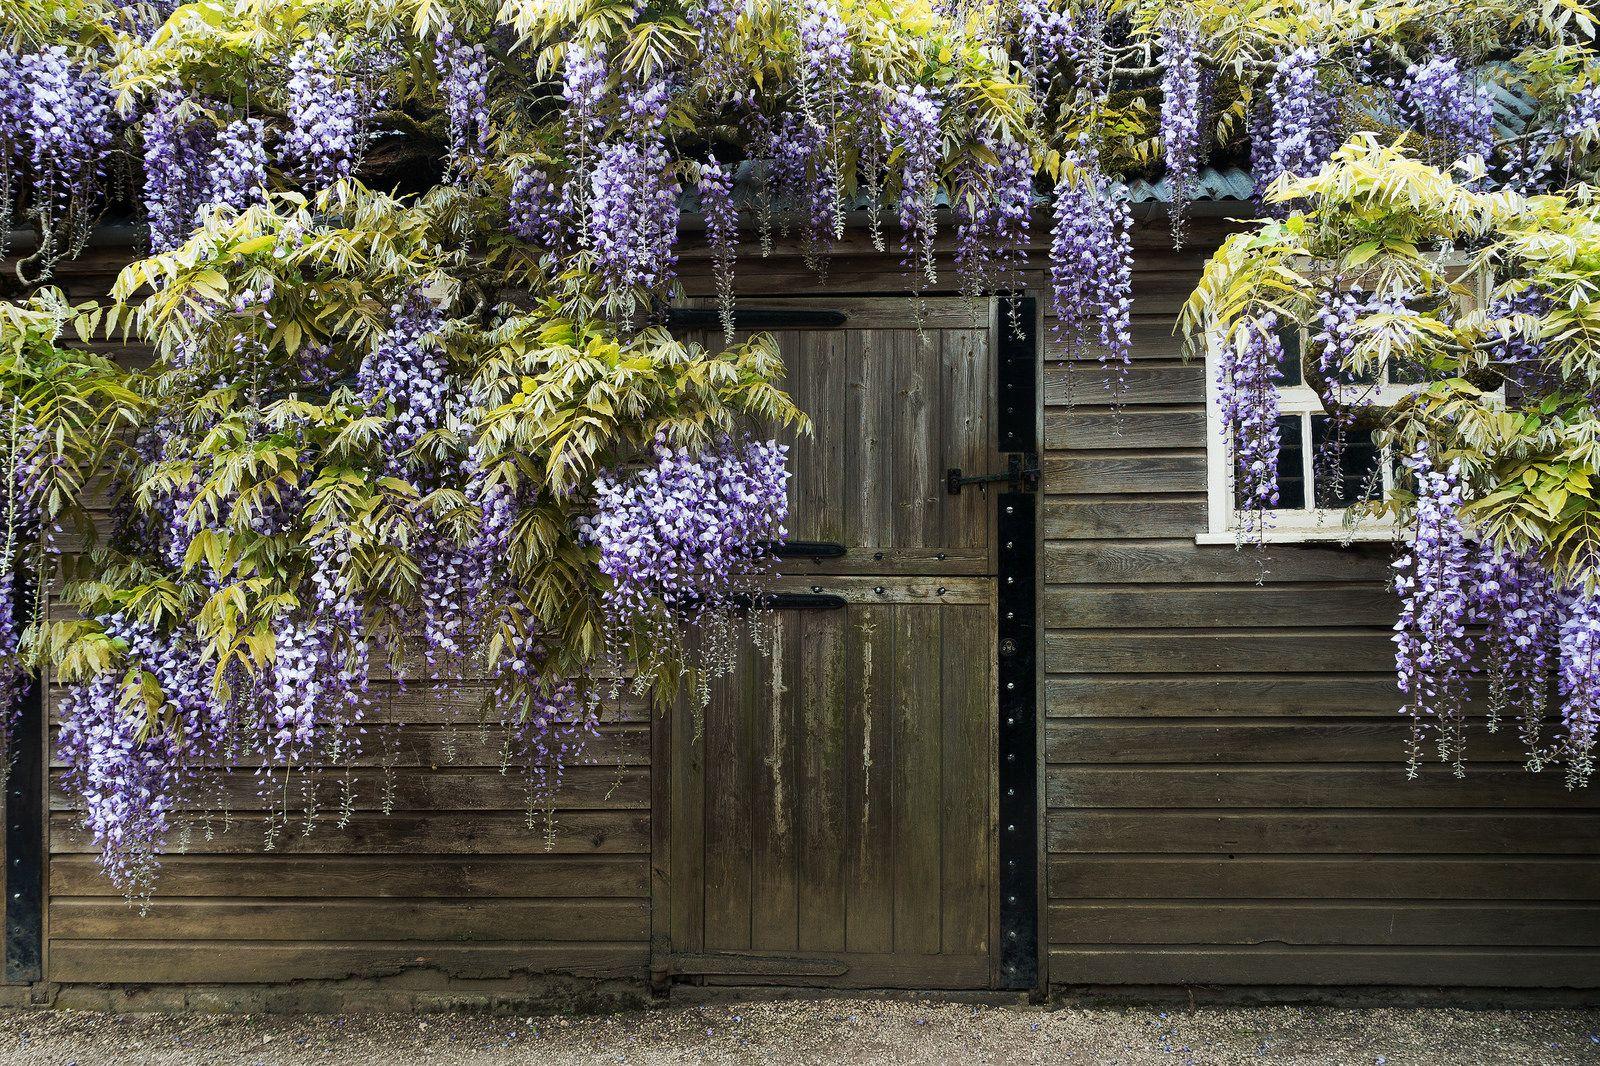 Hidcote Manor Garden | Manor garden, Garden, Outdoor decor on Kingdom Outdoor Living id=41531